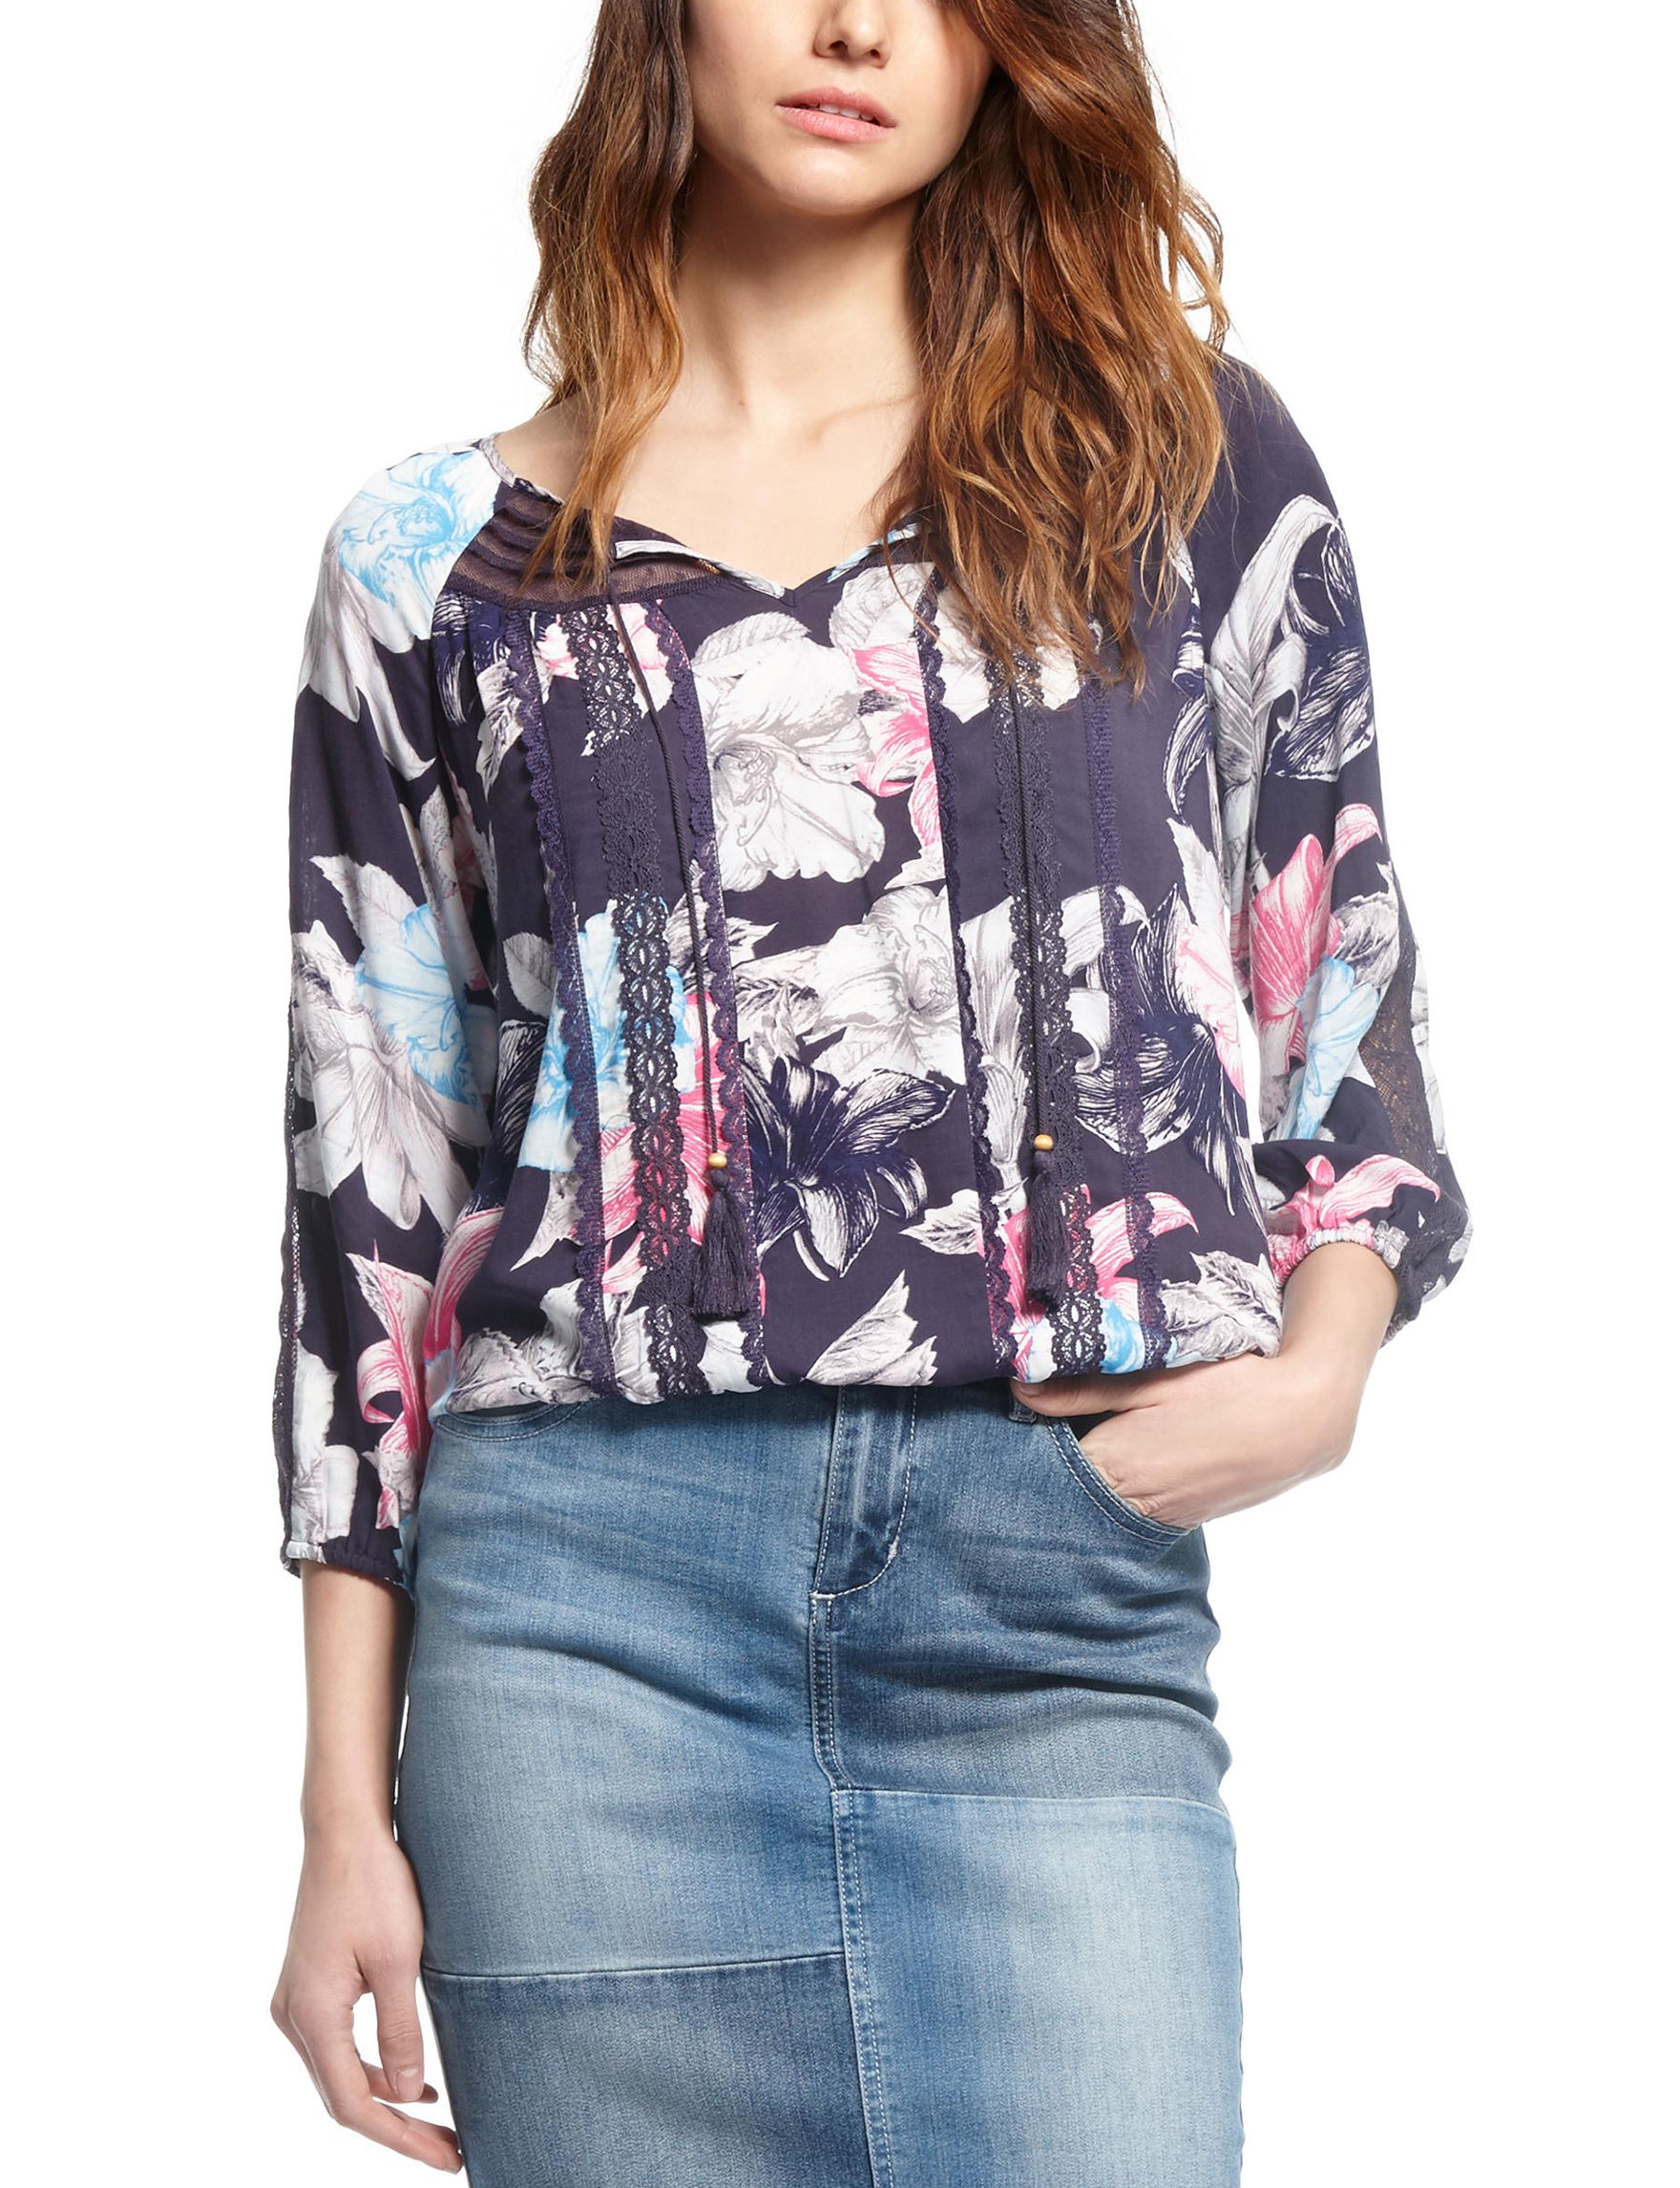 Vintage America Blues Floral Shirts & Blouses